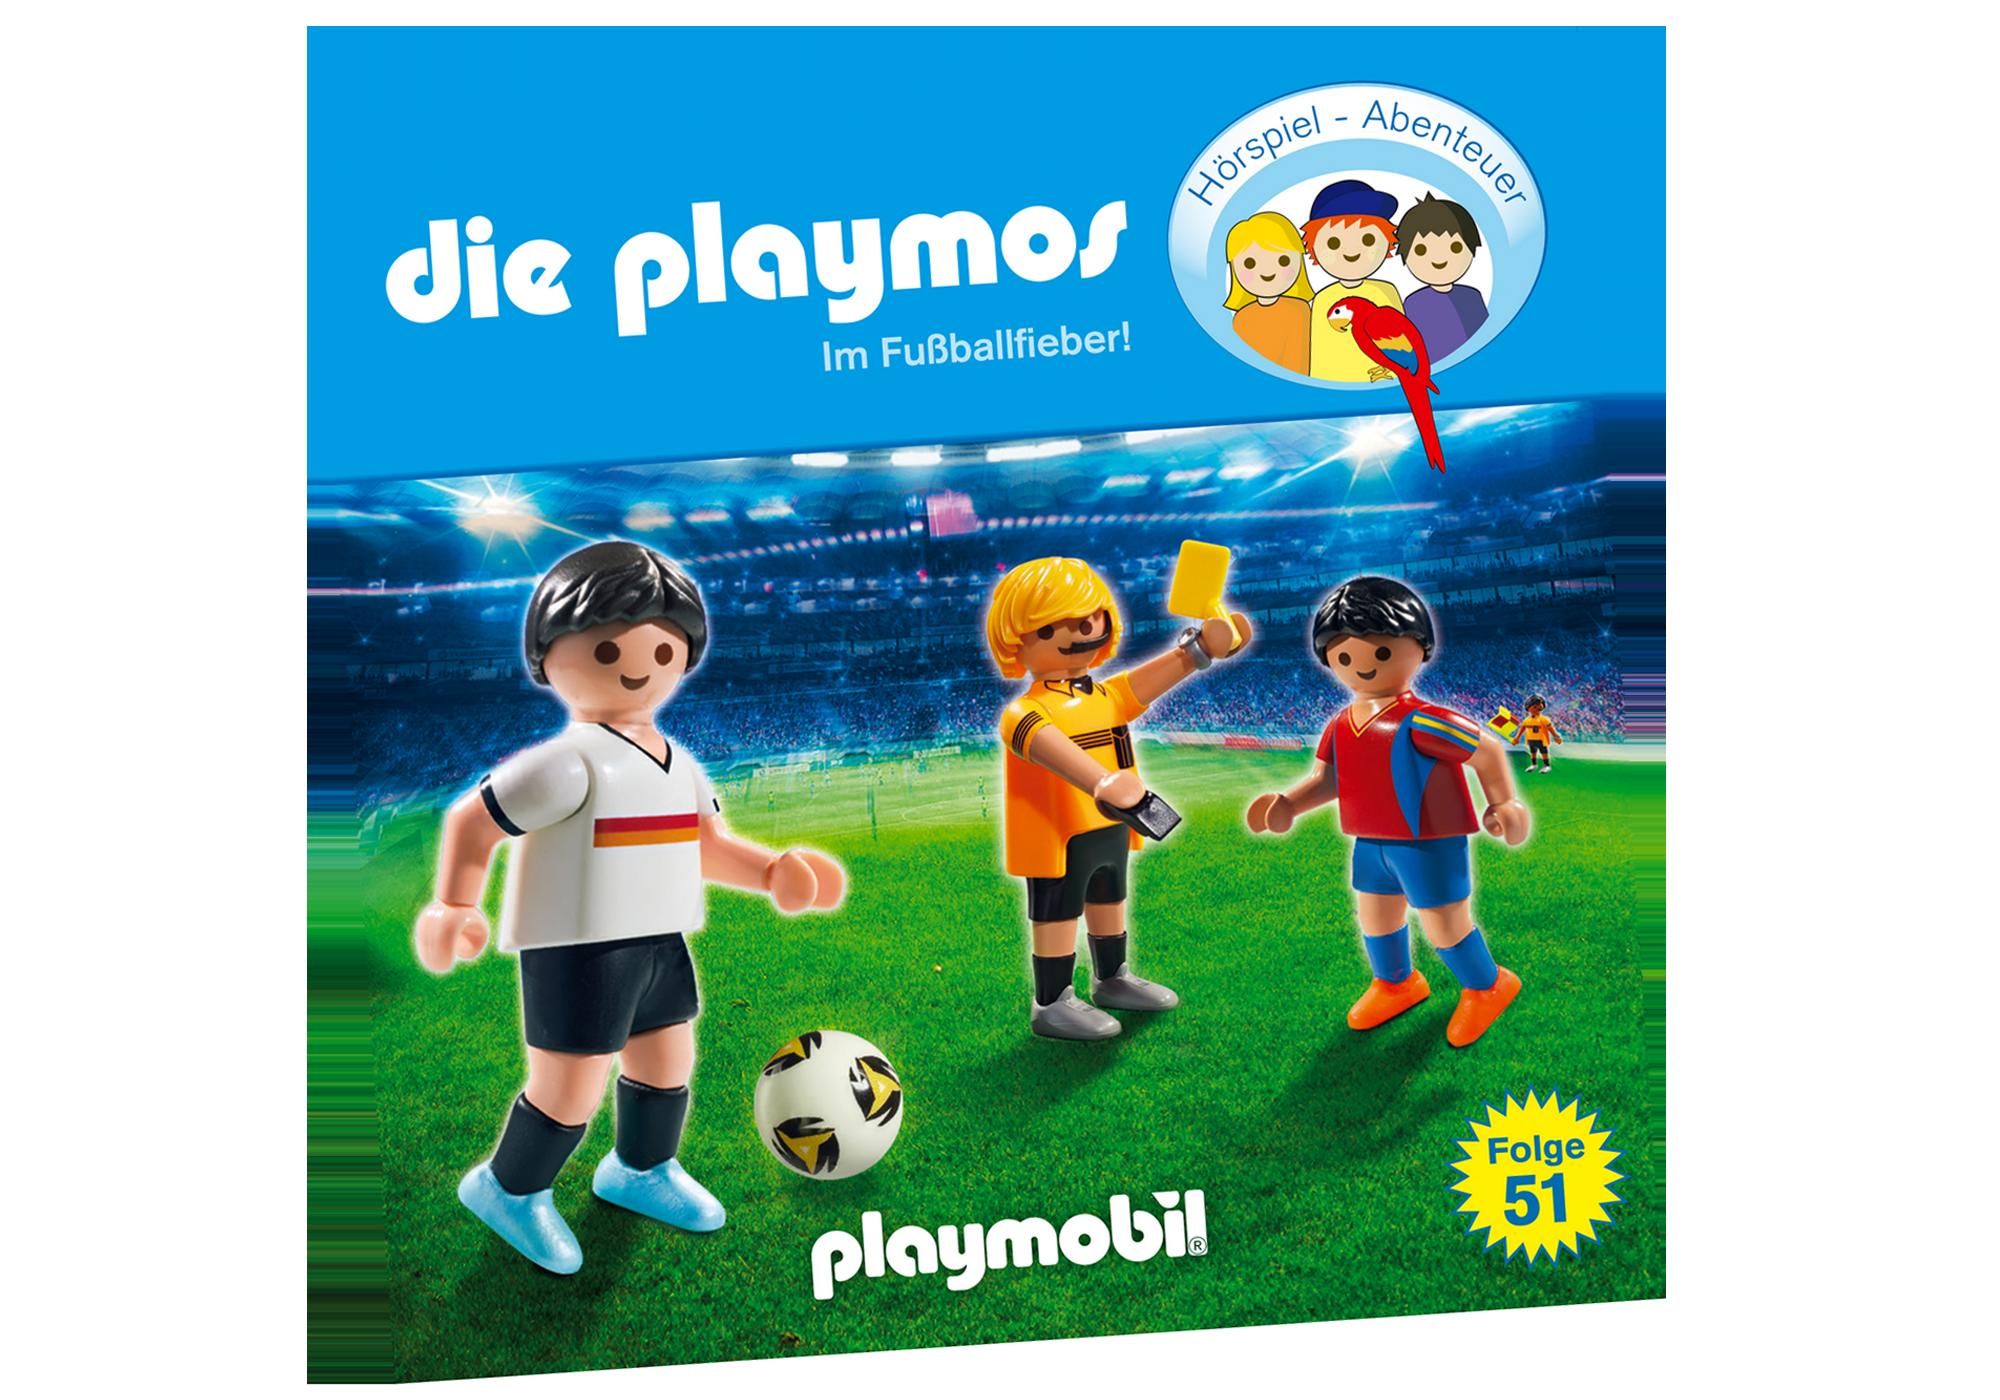 http://media.playmobil.com/i/playmobil/80258_product_detail